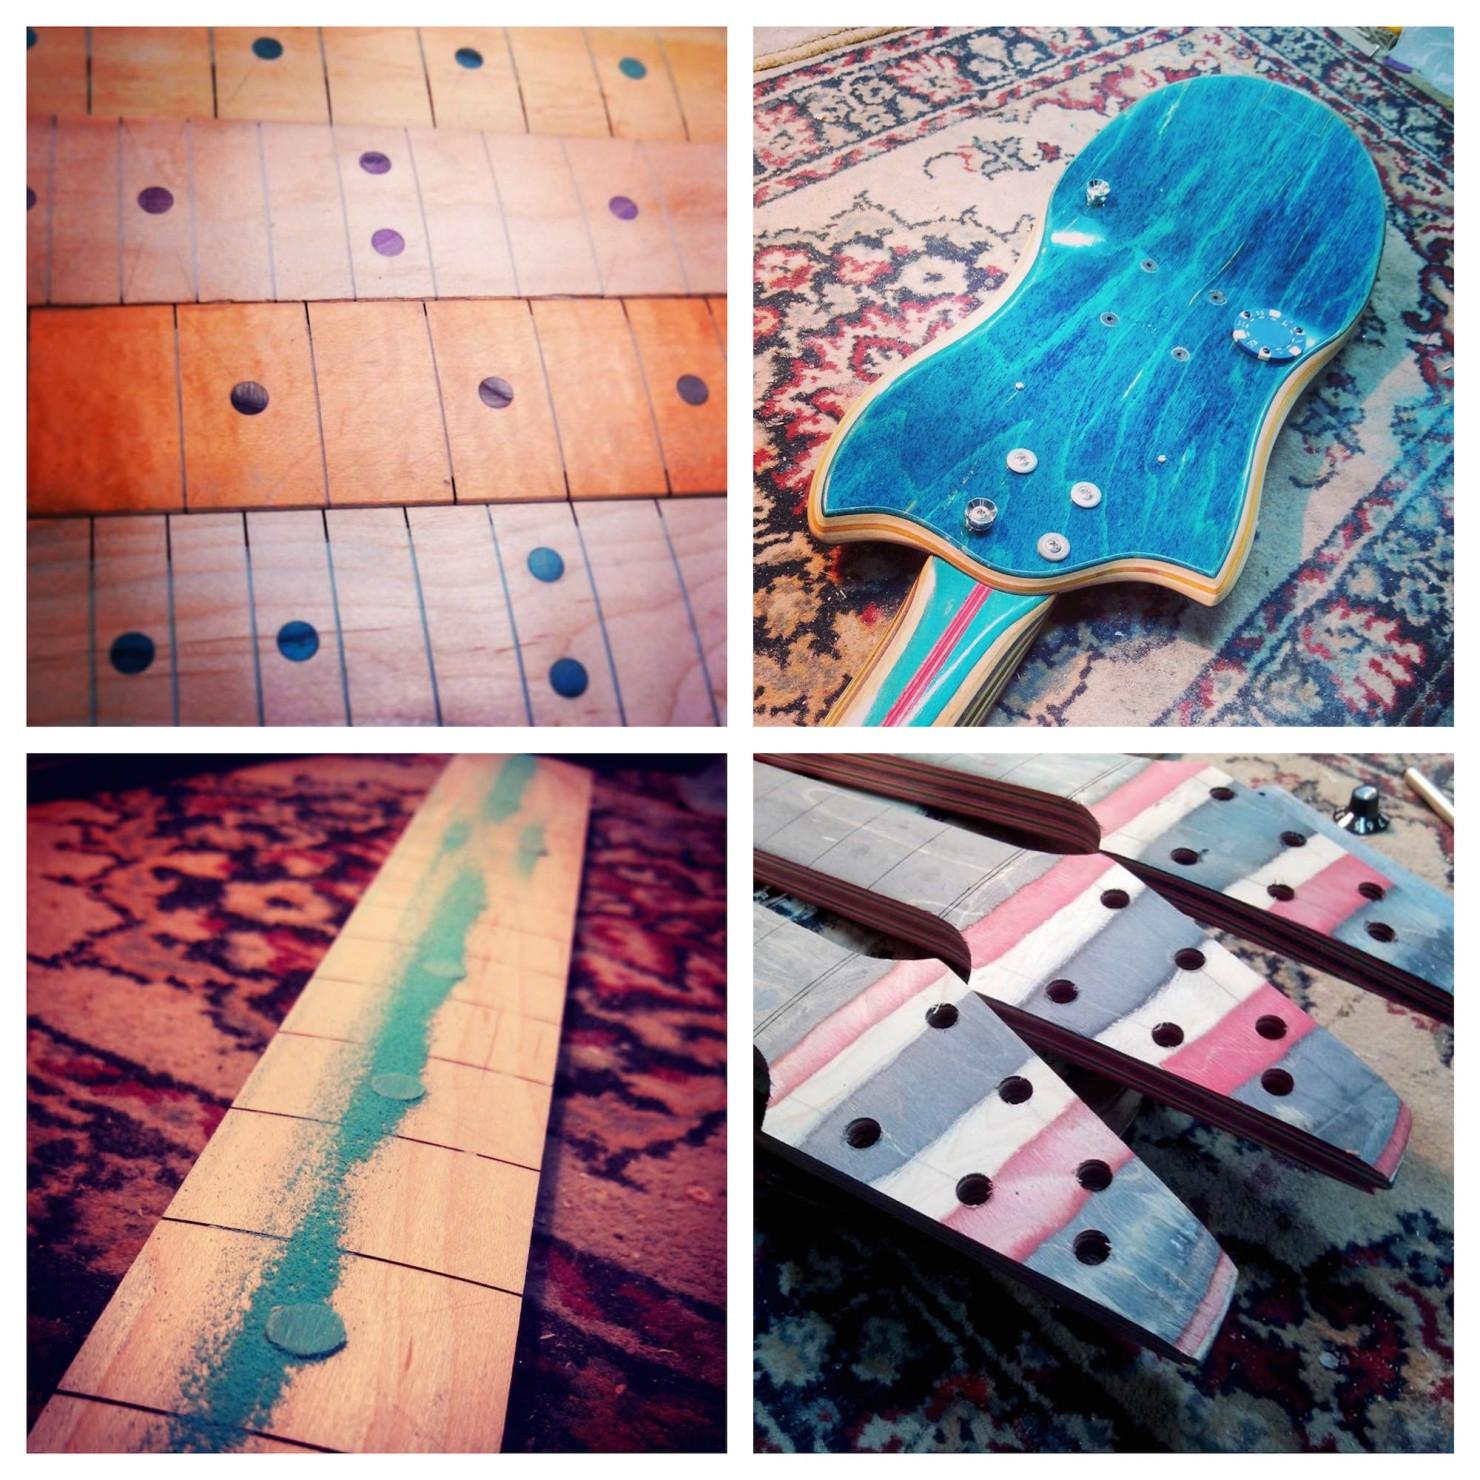 Skateboard_Guitars_1_Collage-1480x1480